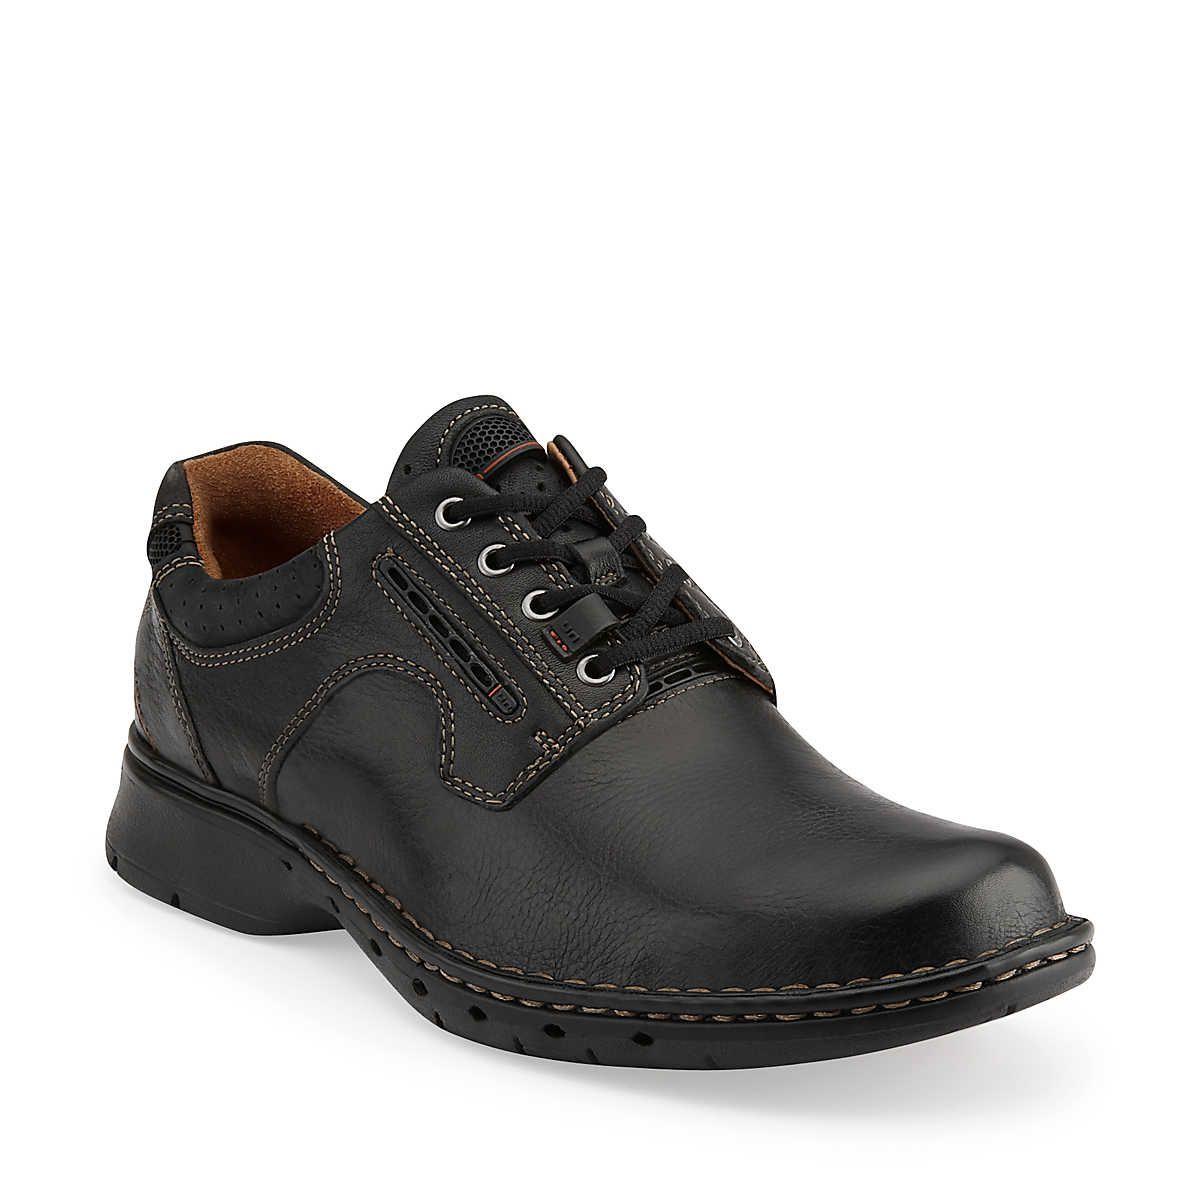 Un.Ravel in Black Leather - Mens Shoes